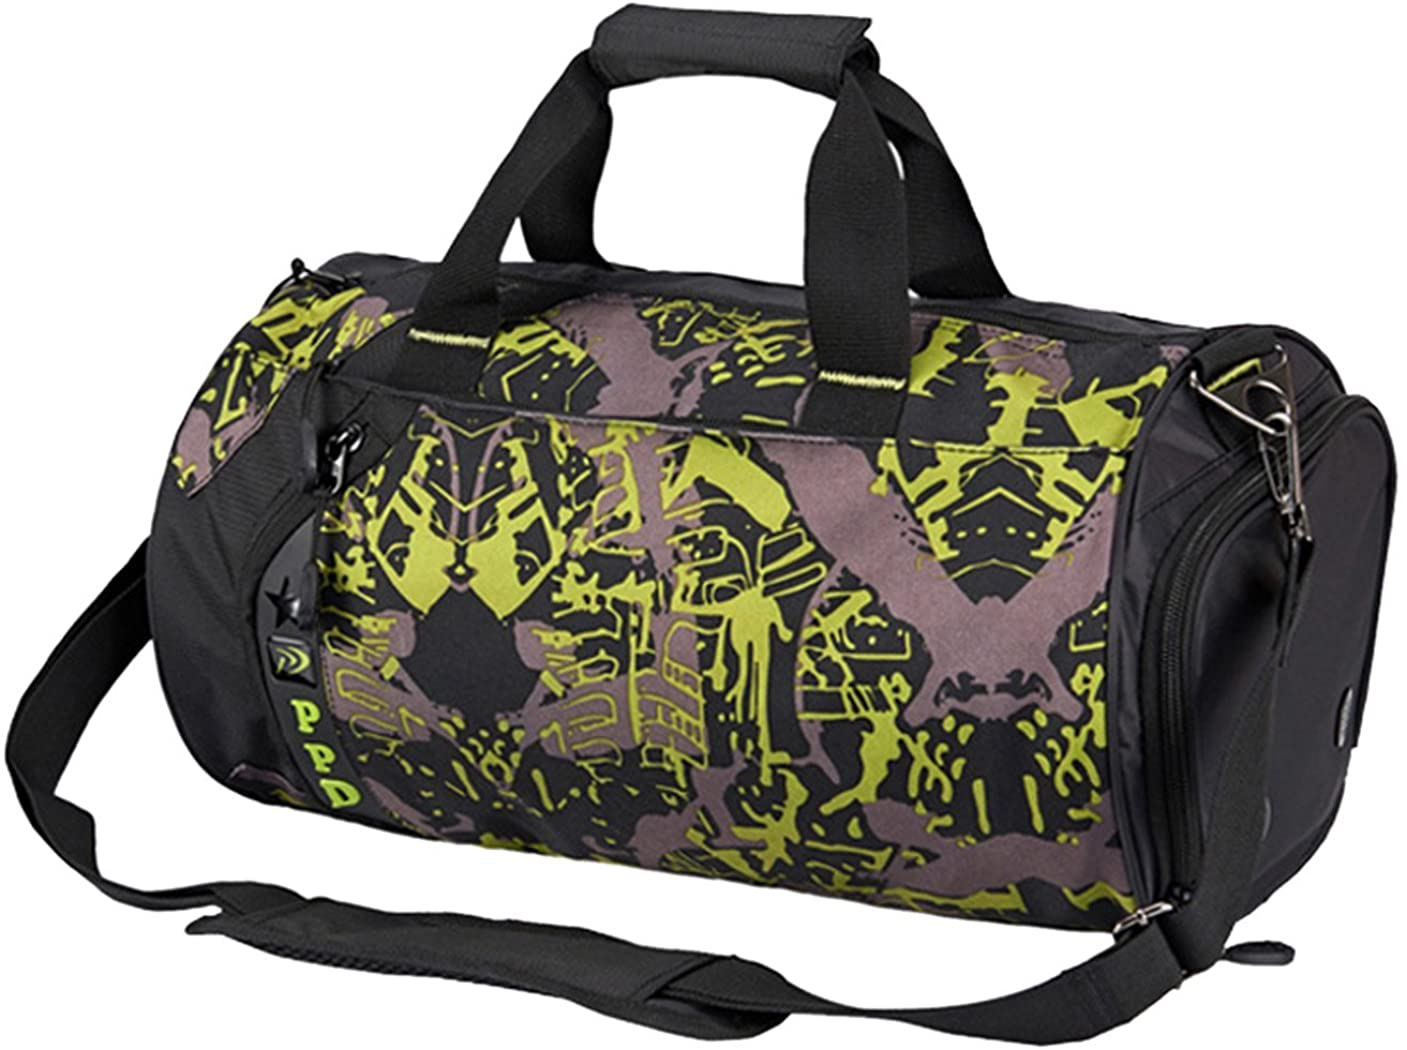 PPD Sporty Gear Duffel Bags Lightweight Durable Gym Bag